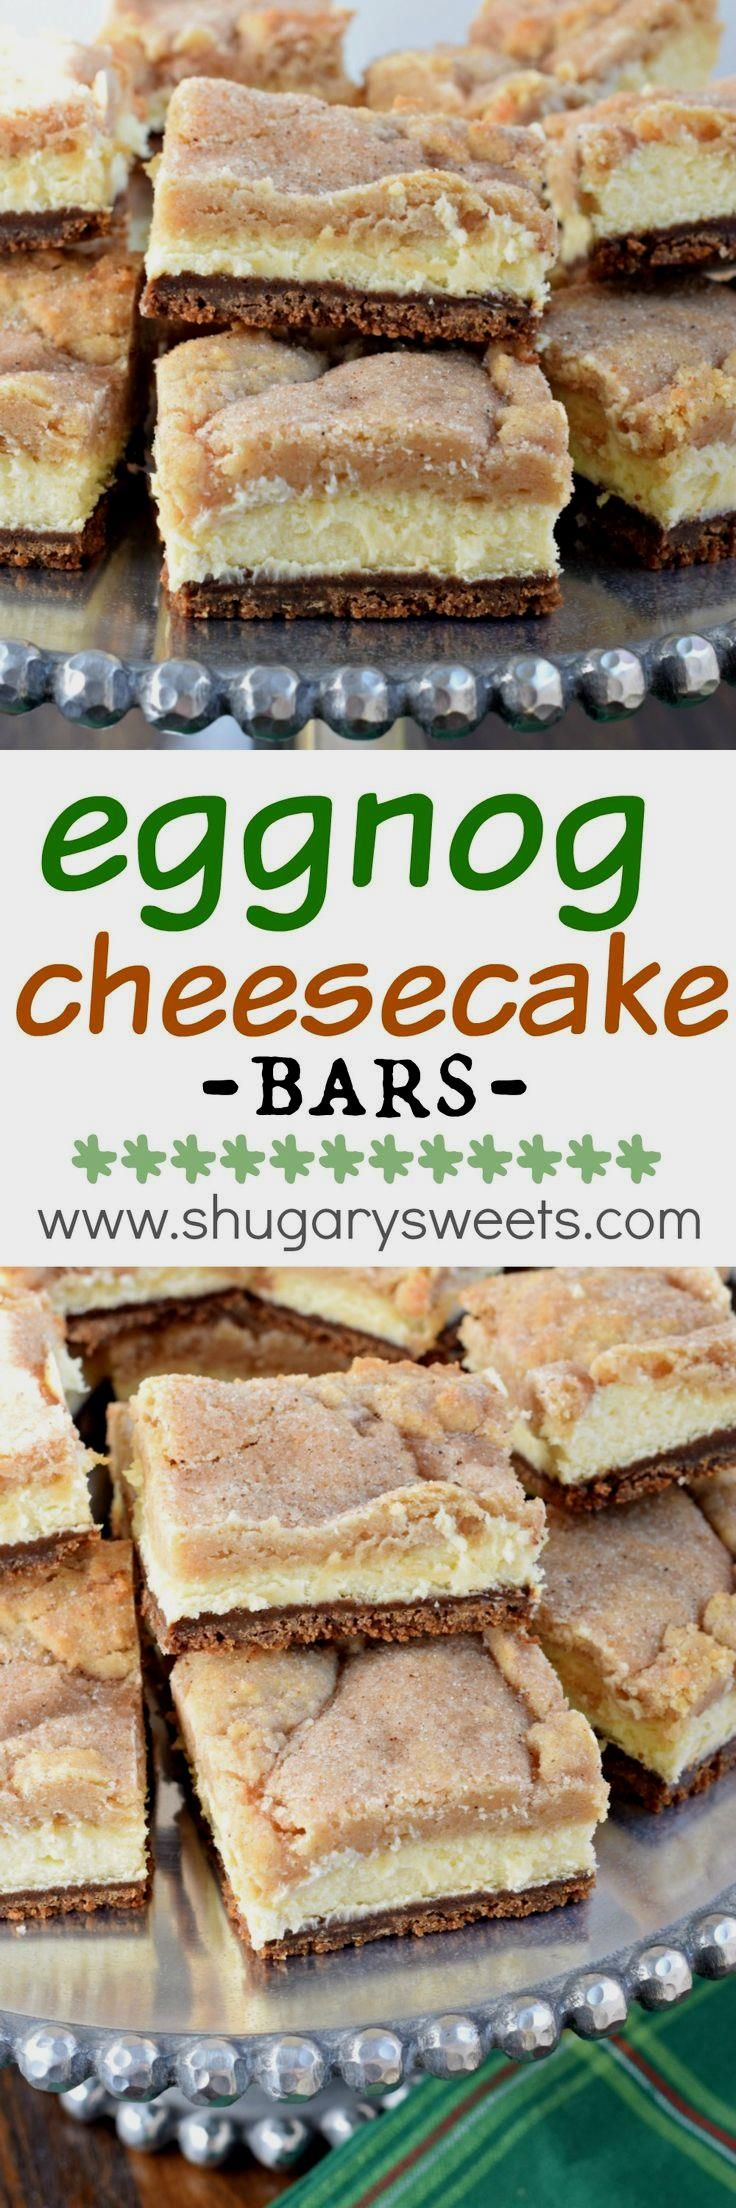 Layered Eggnog Cheesecake bars with a gingersnap crust…